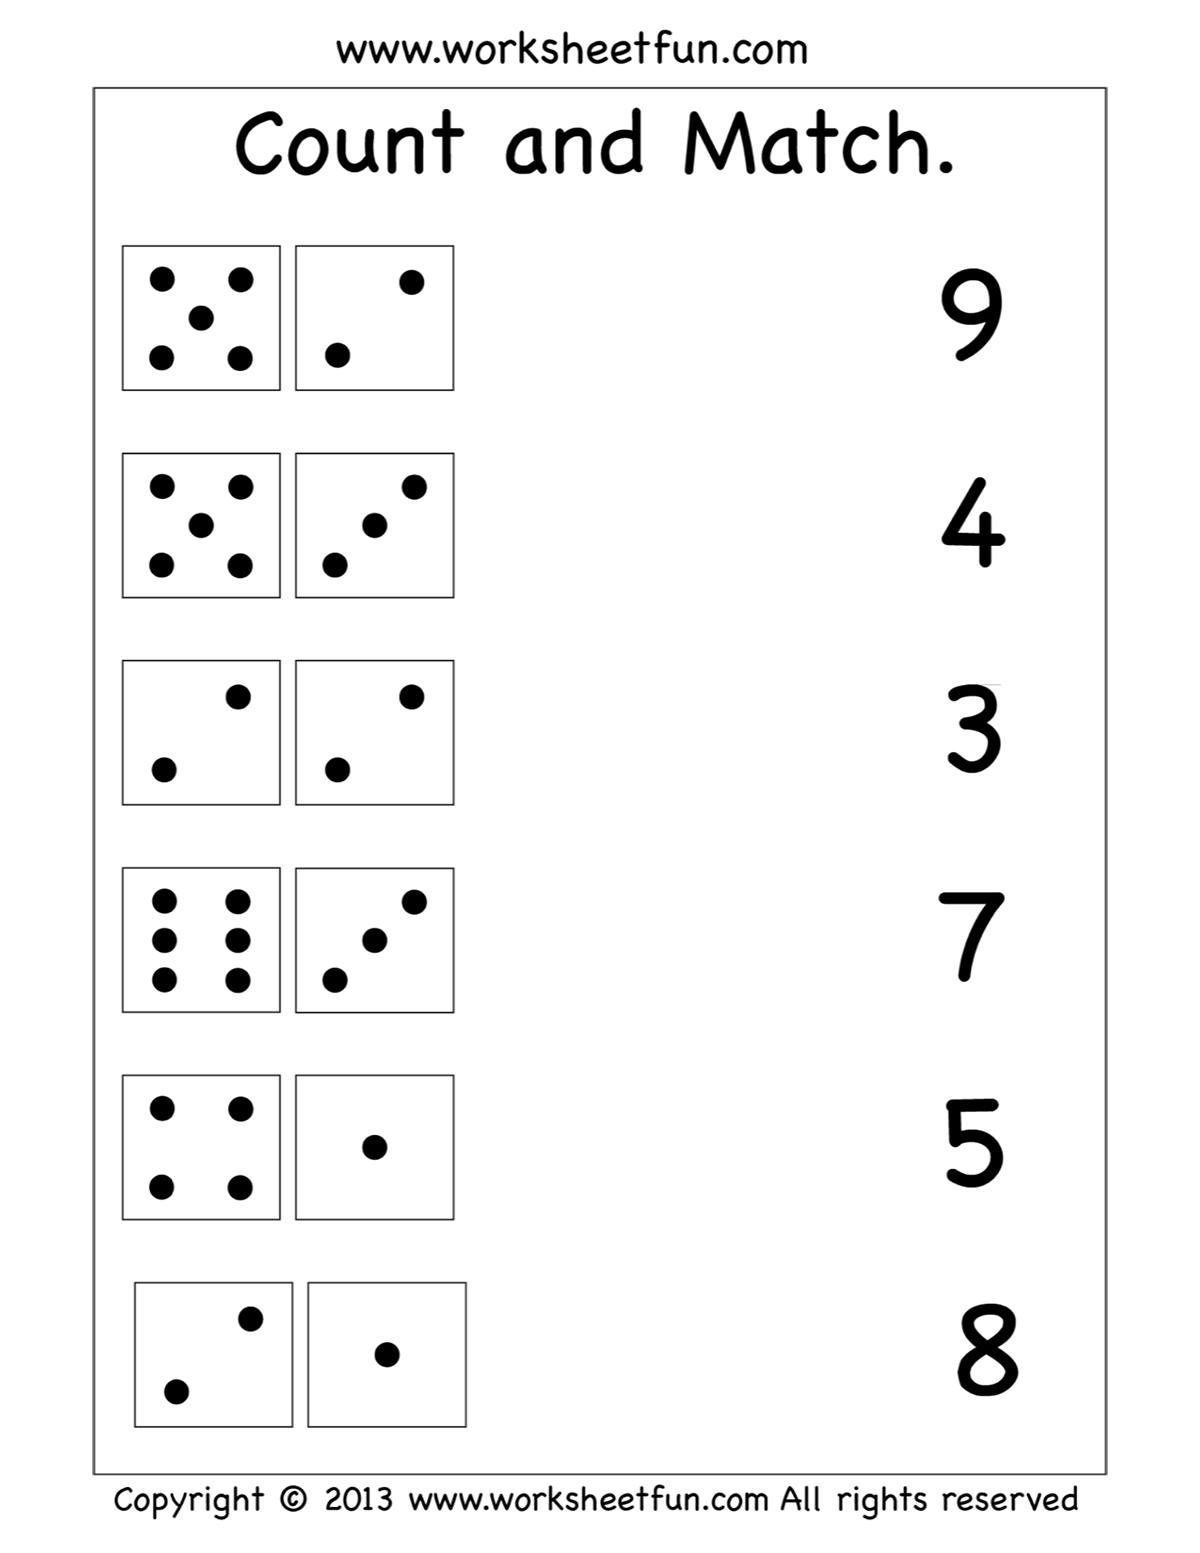 Count And Match Worksheet Preschool Math Worksheets Kindergarten Math Worksheets Kindergarten Math Worksheets Free [ 1553 x 1200 Pixel ]